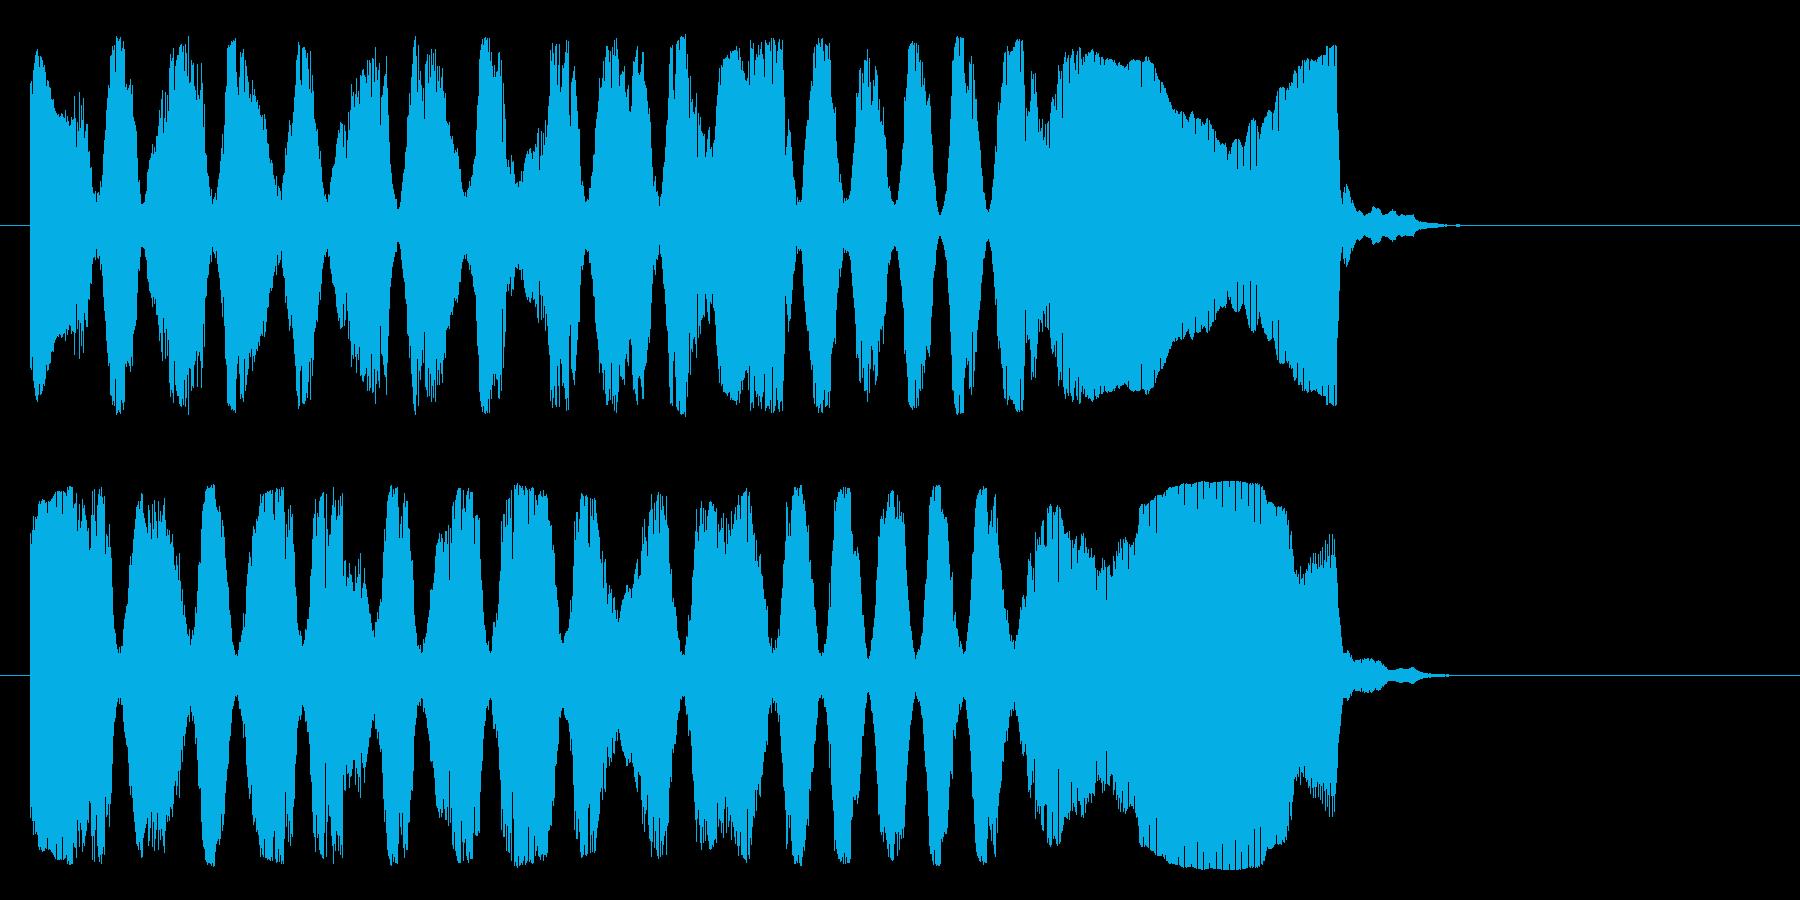 ウワンウワンウワンウワンウワ~ン~の再生済みの波形